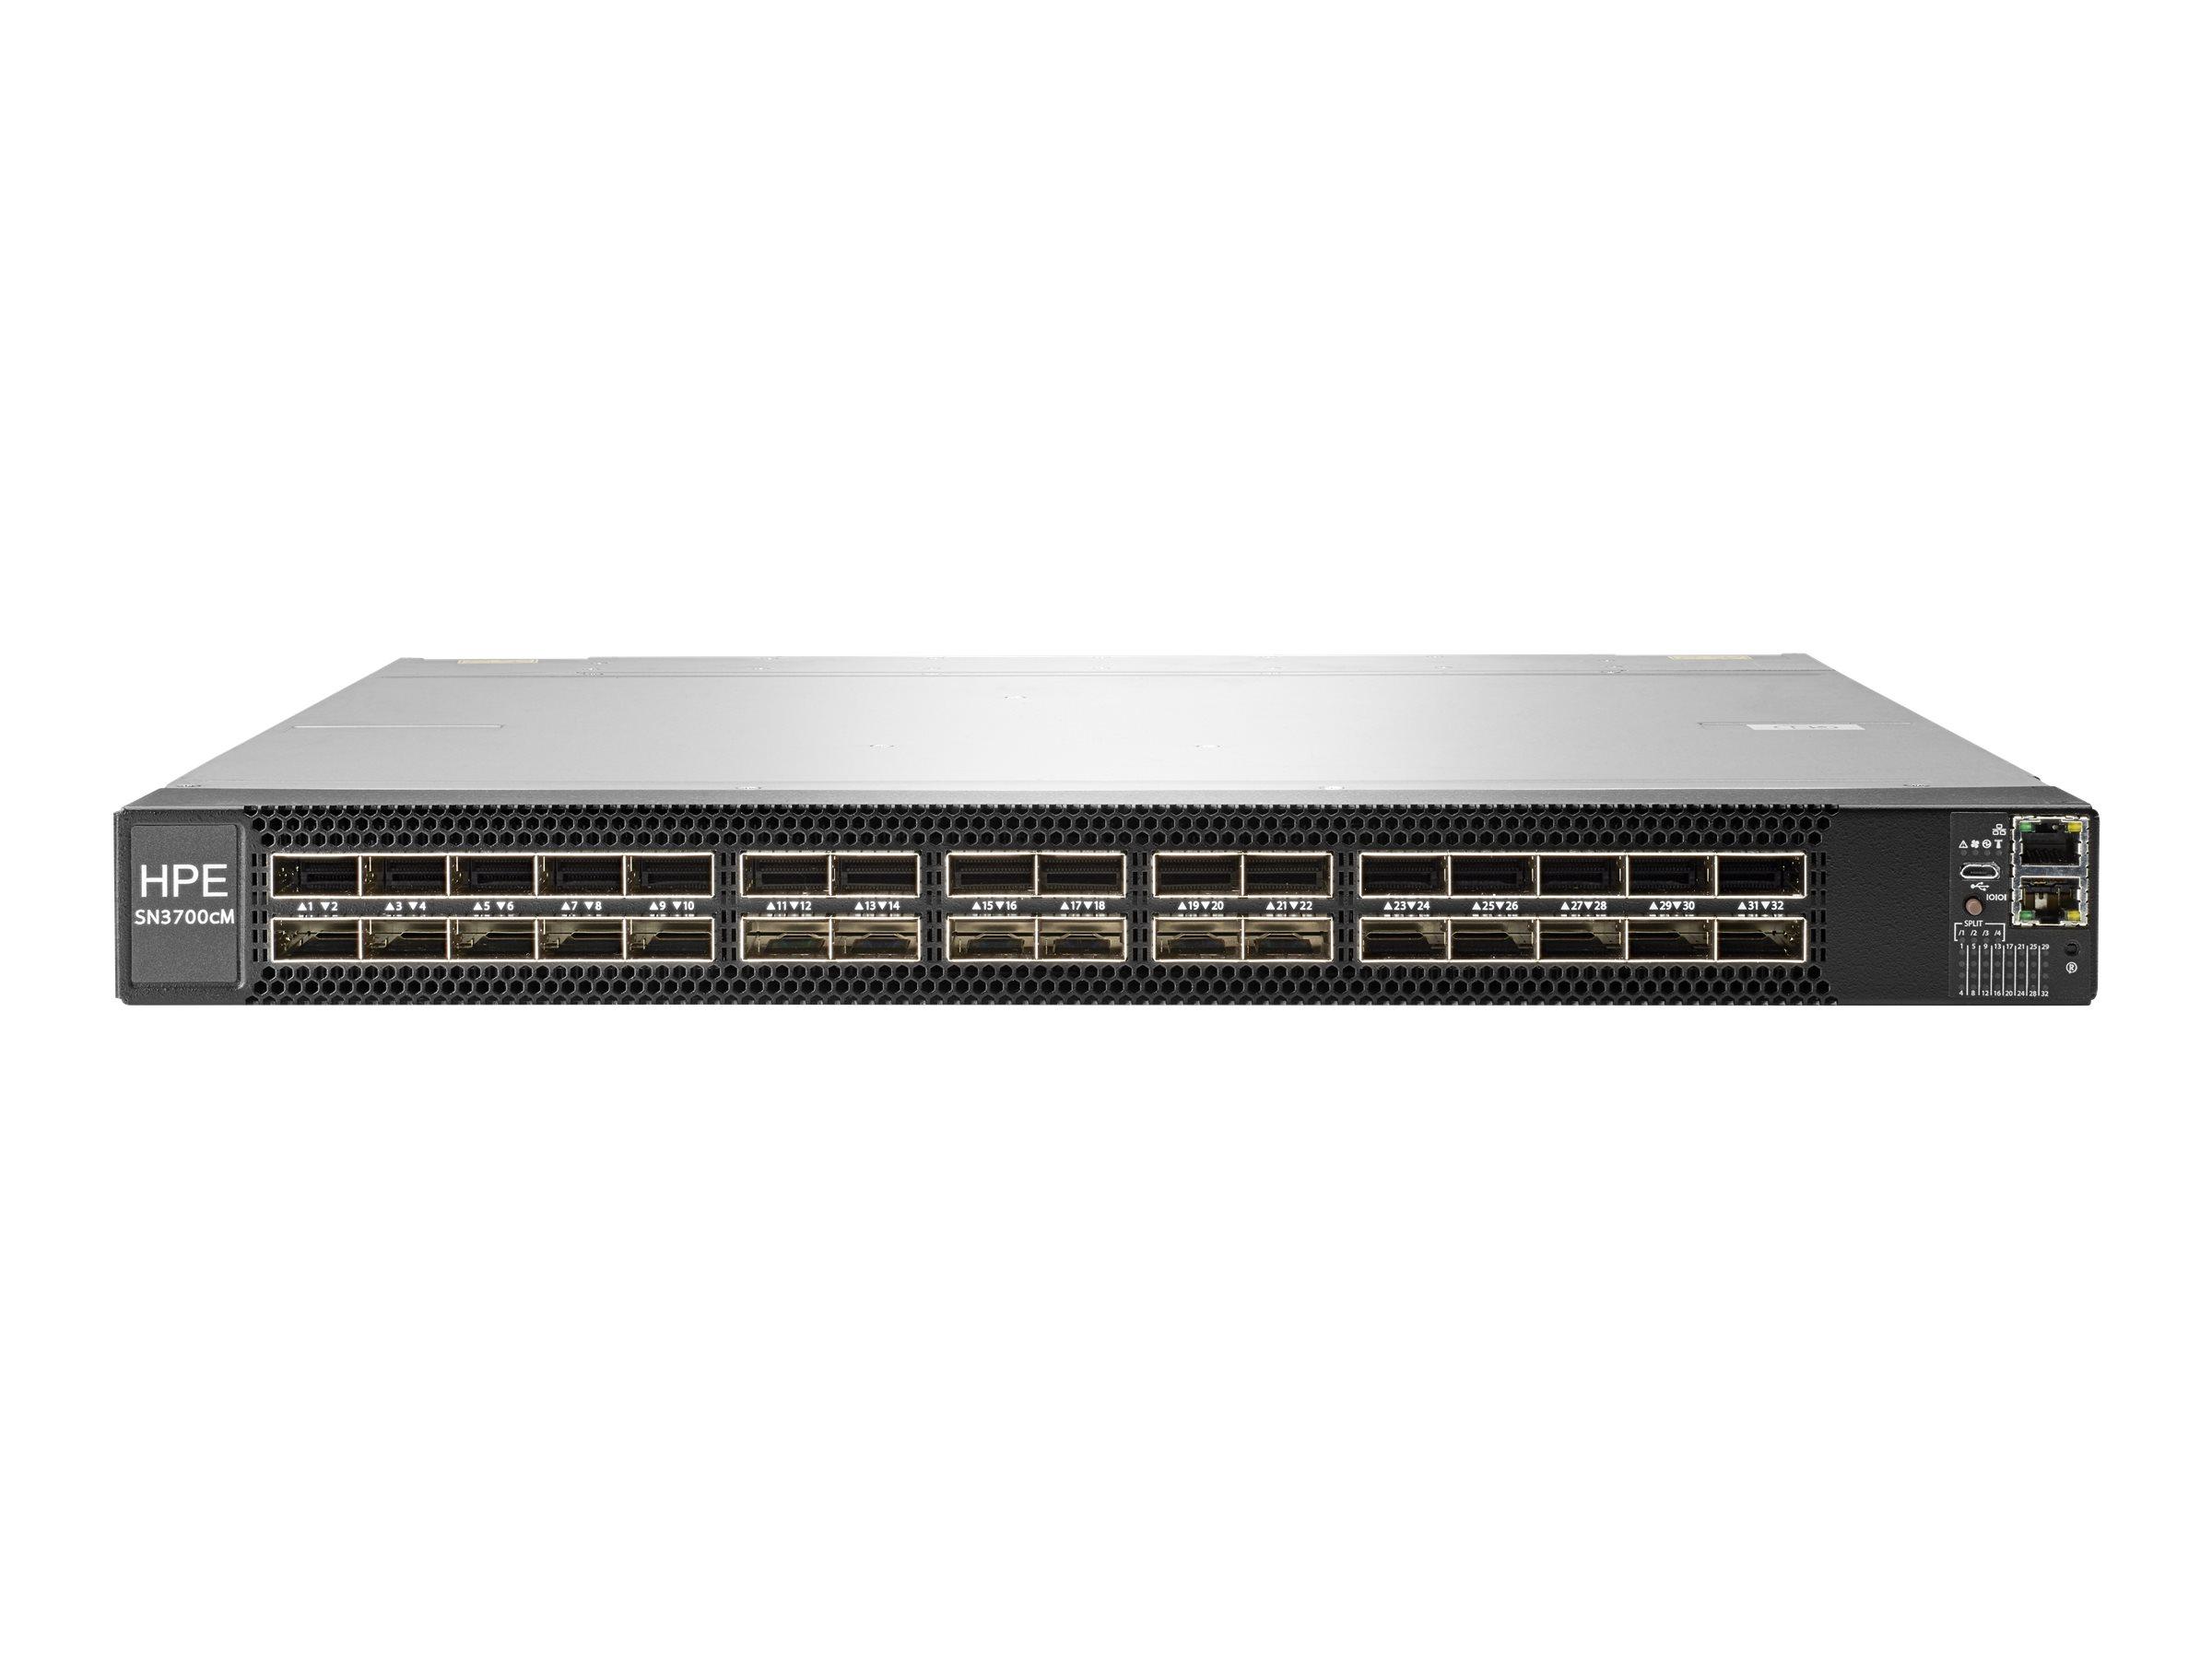 HPE SN3700cM 100GbE 32QSFP28 Switch - M-Series - Switch - L3 - managed - 32 x 100 Gigabit QSFP28